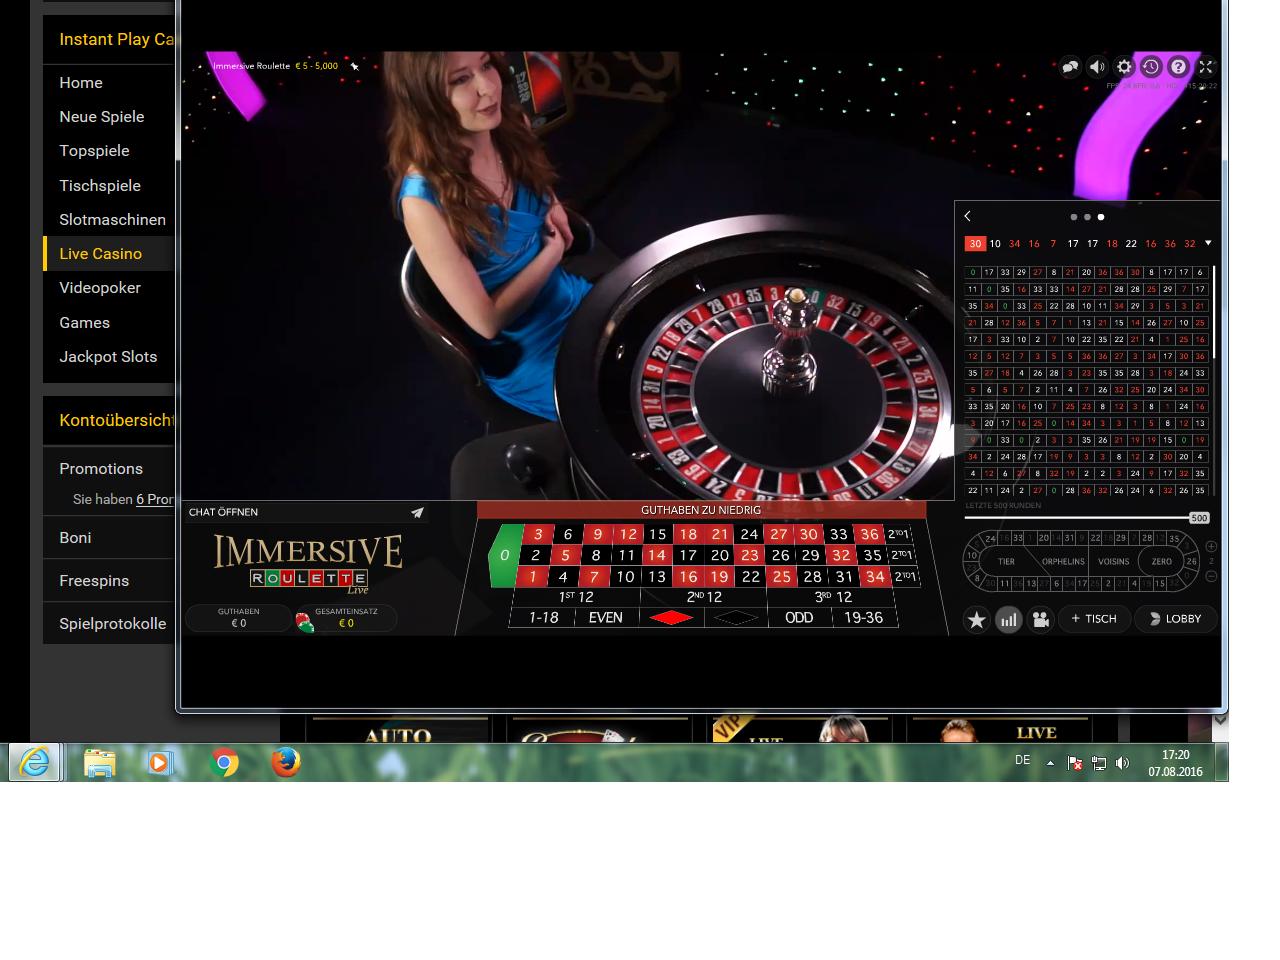 doubledown casino chips generator v2.0 password